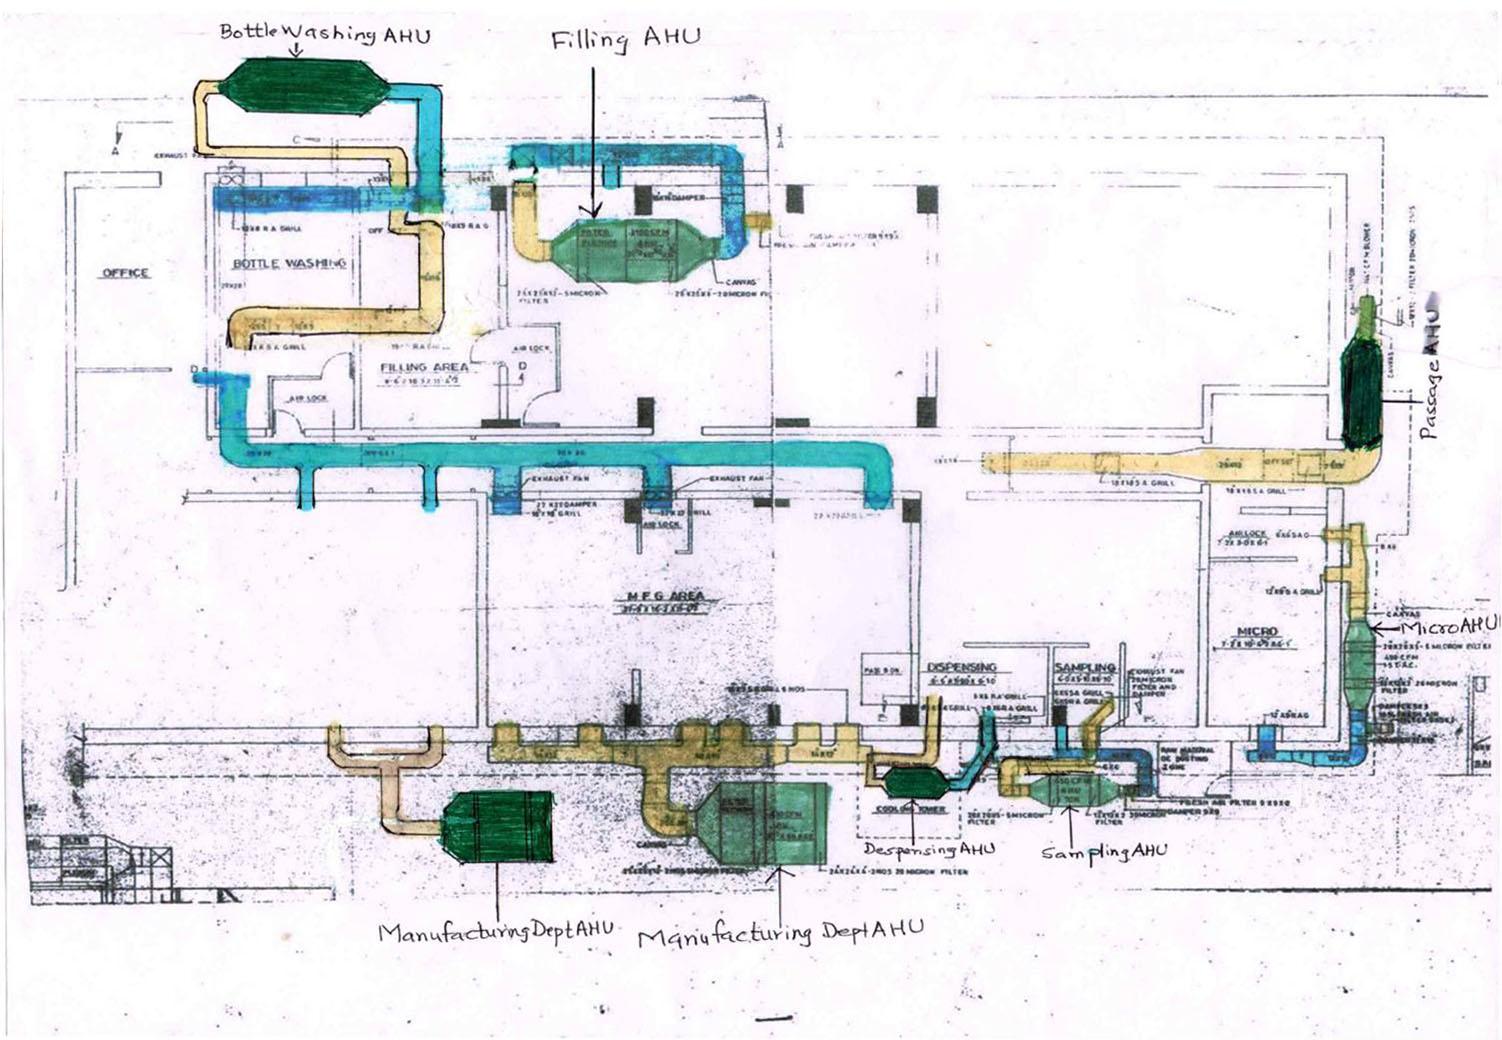 Eumarkpharma.com/HVAC System on